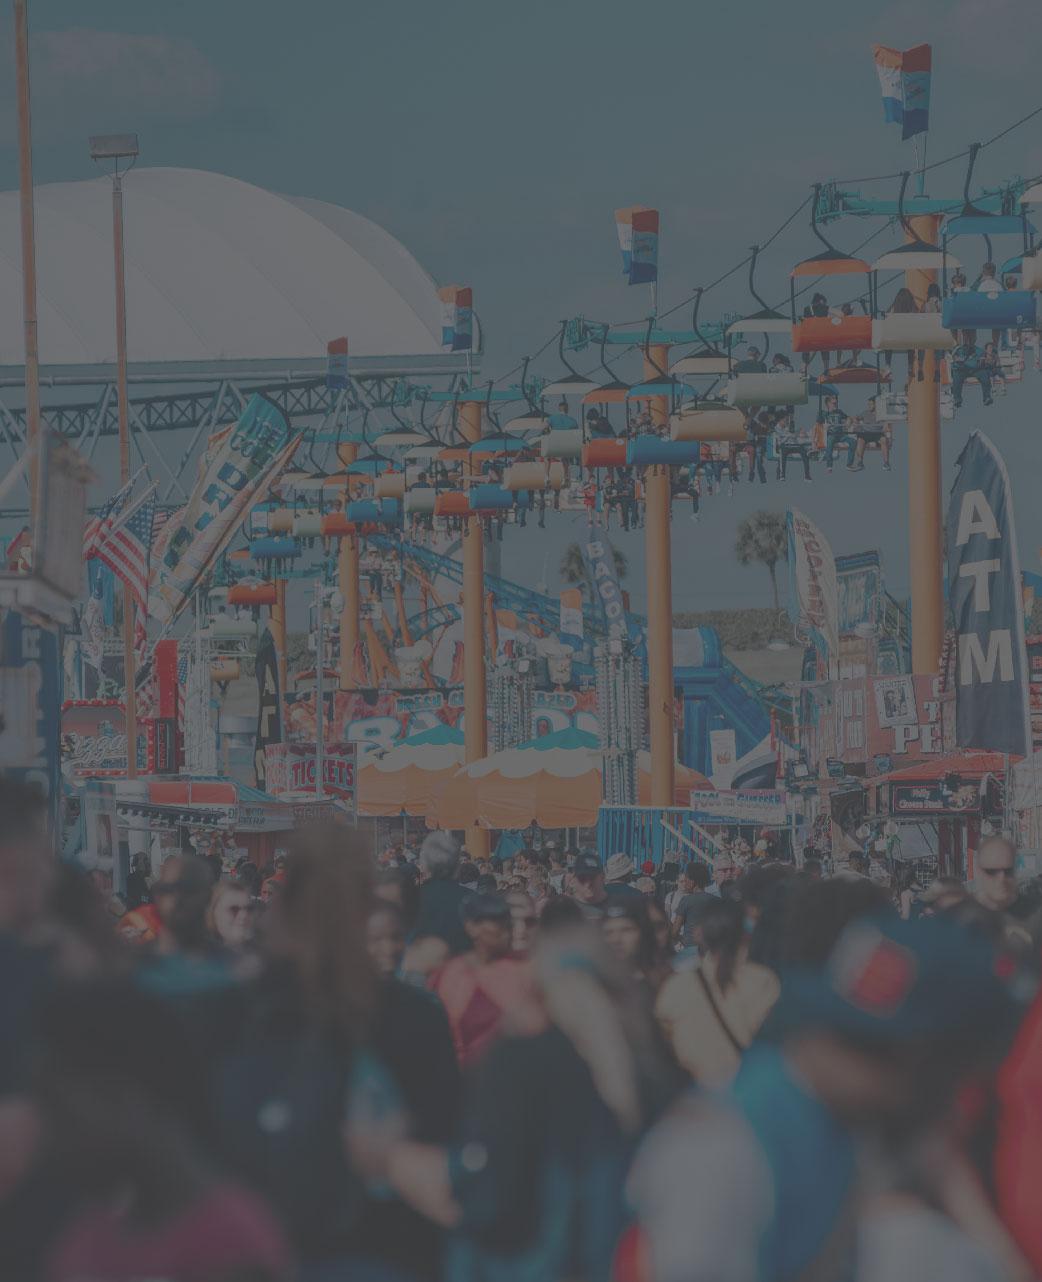 Florida State Fair Thanks 2020 Sponsors – Florida State Fair Within Florida State Gairground Calendar